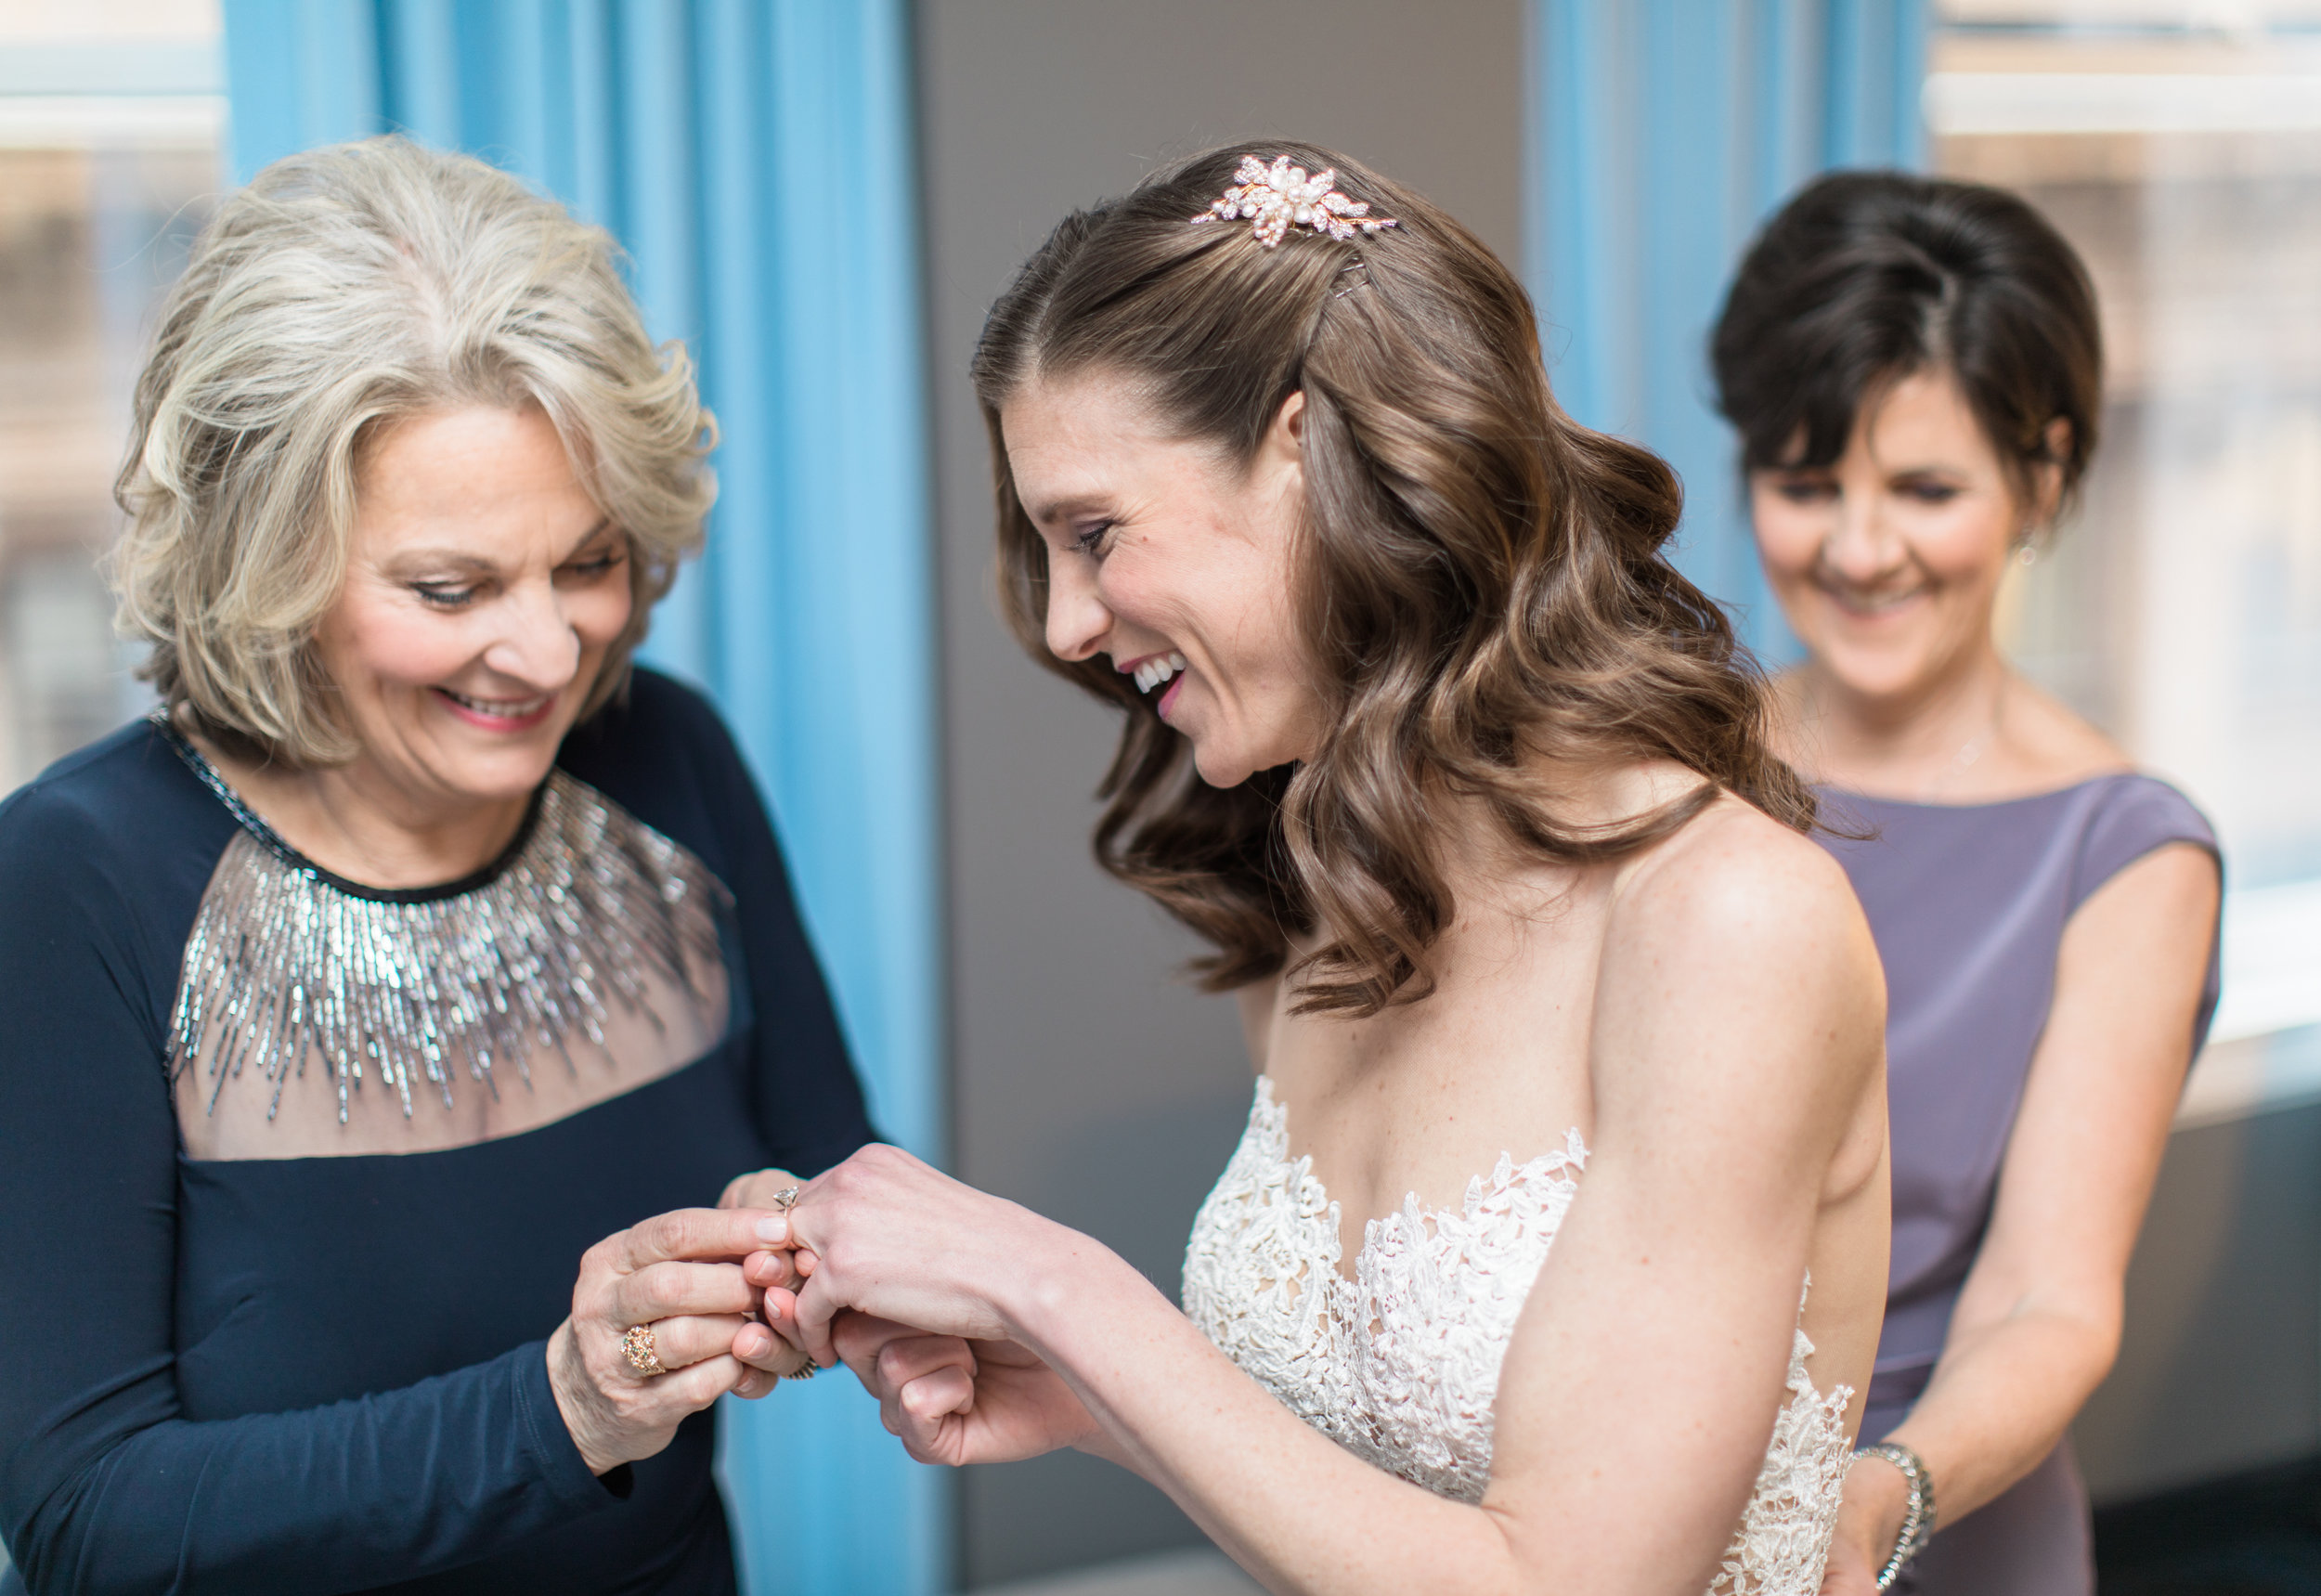 Bonphotage Chicago Wedding Photography - Holy Family Church + Ovation